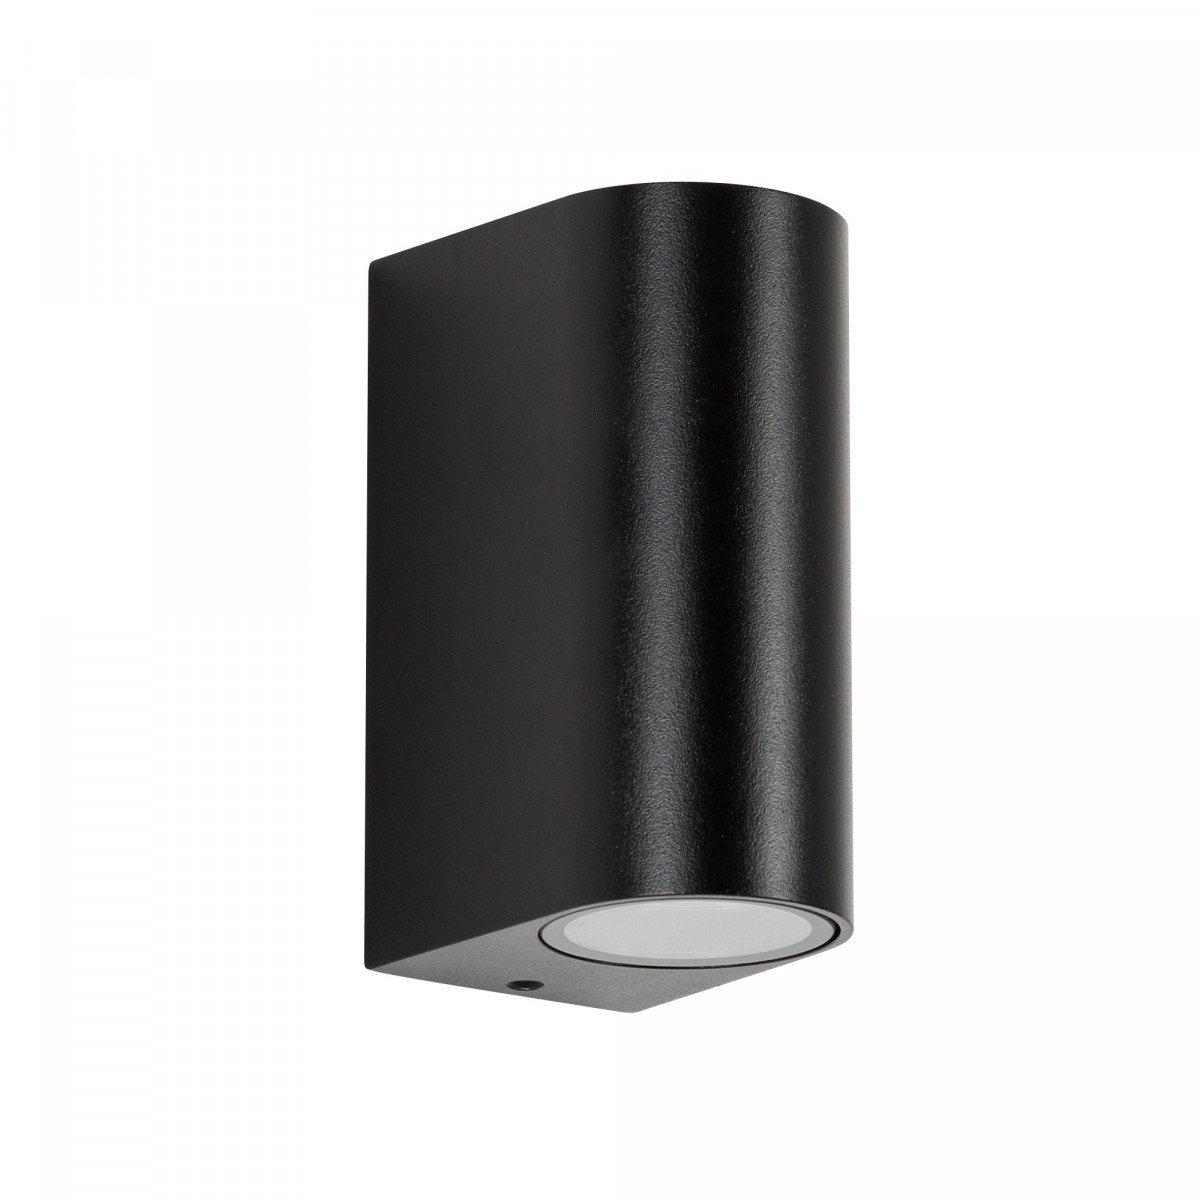 Außenbeleuchtung Flash Up & Down Schwarz Wandbeleuchtung